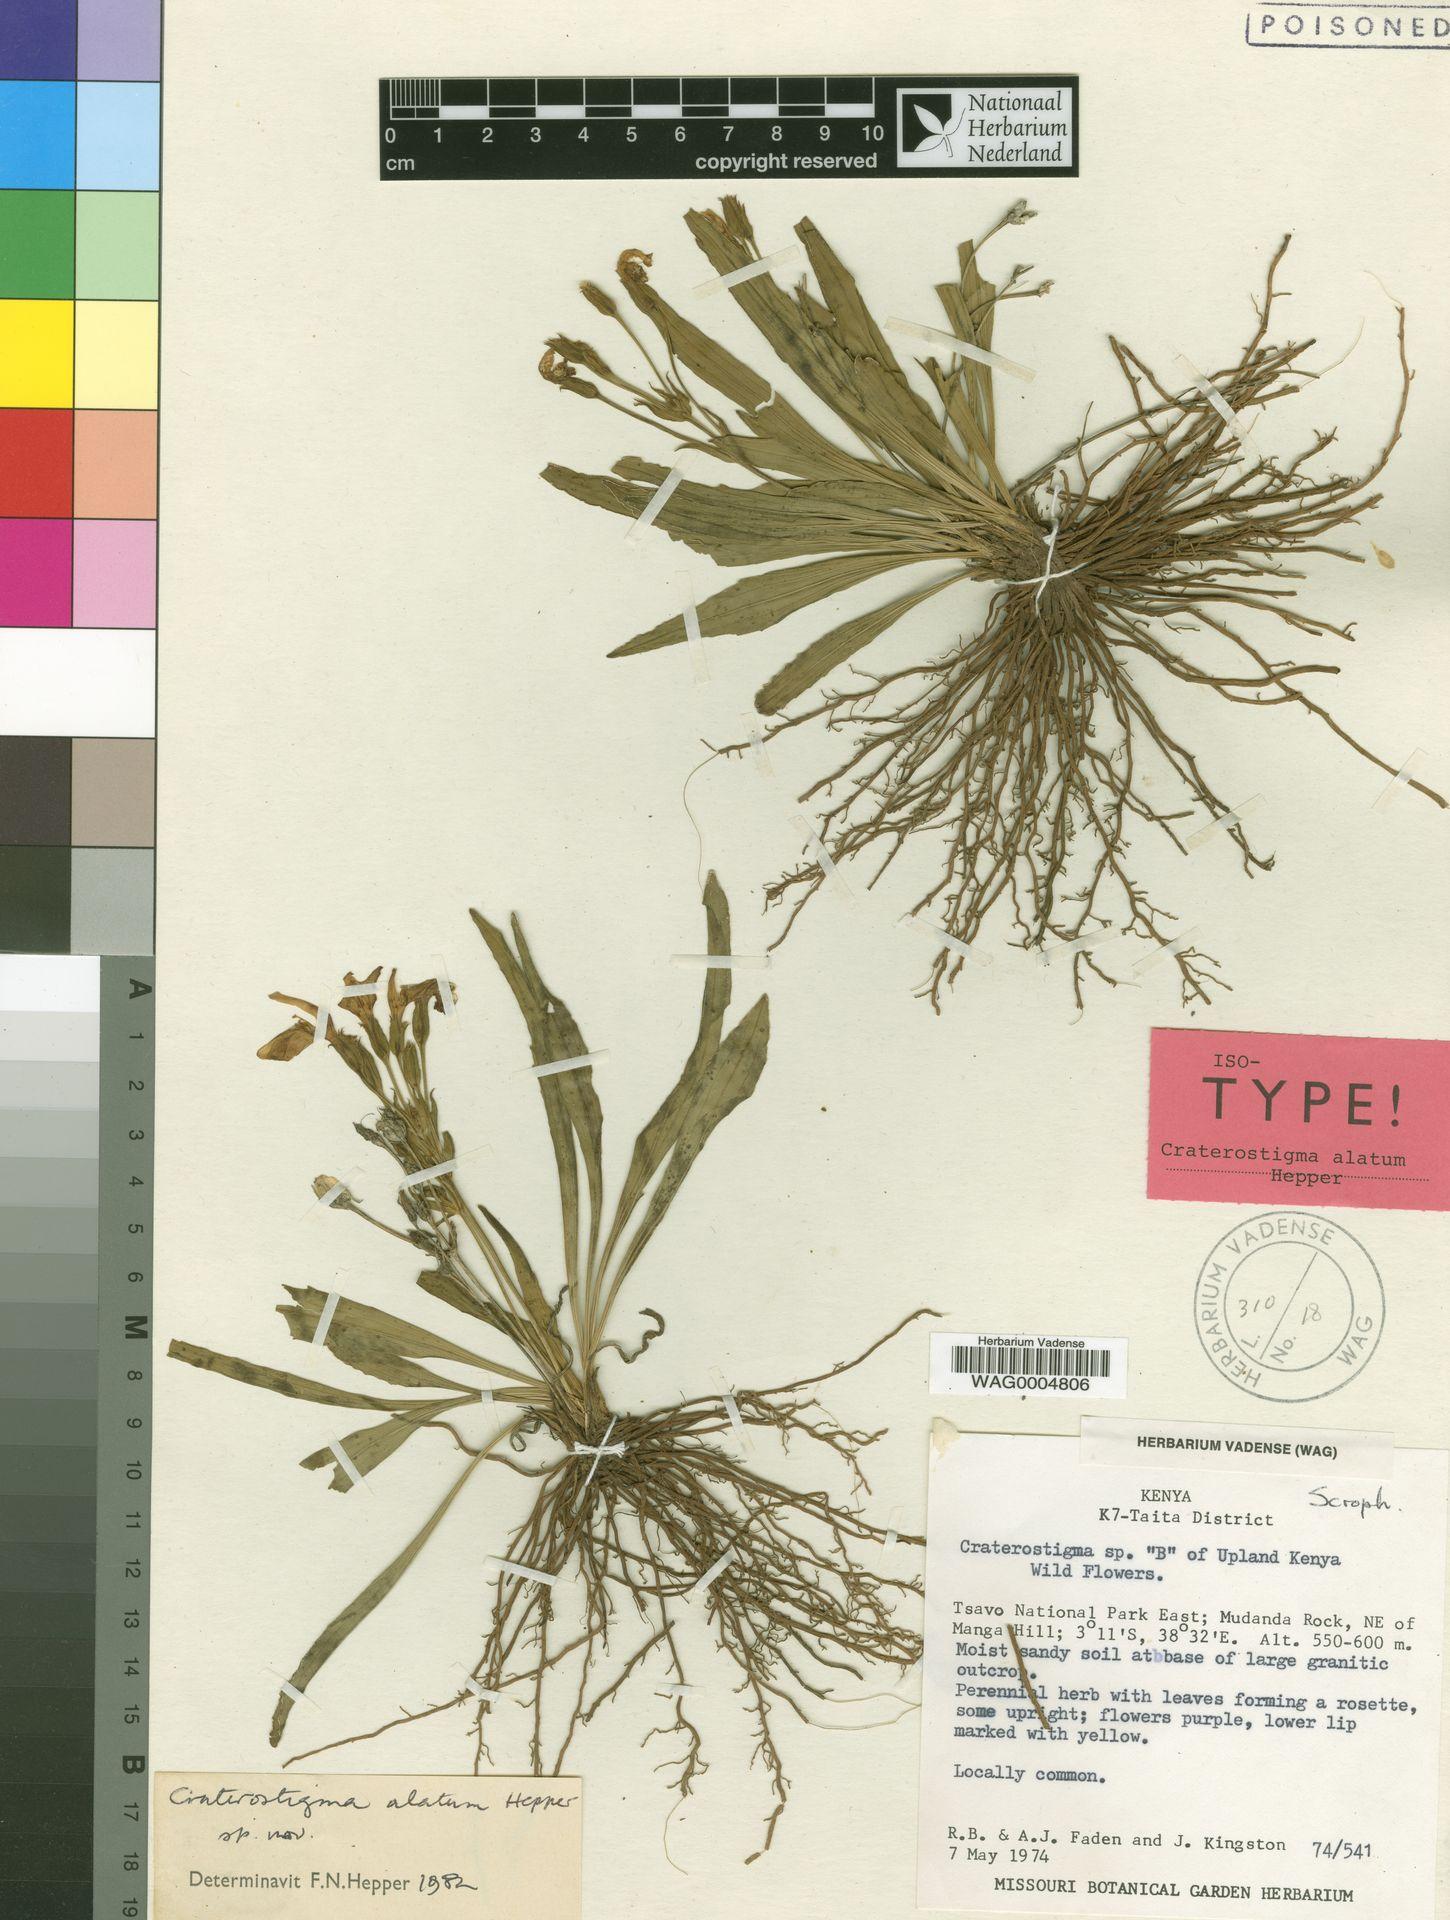 WAG0004806 | Craterostigma alatum Hepper